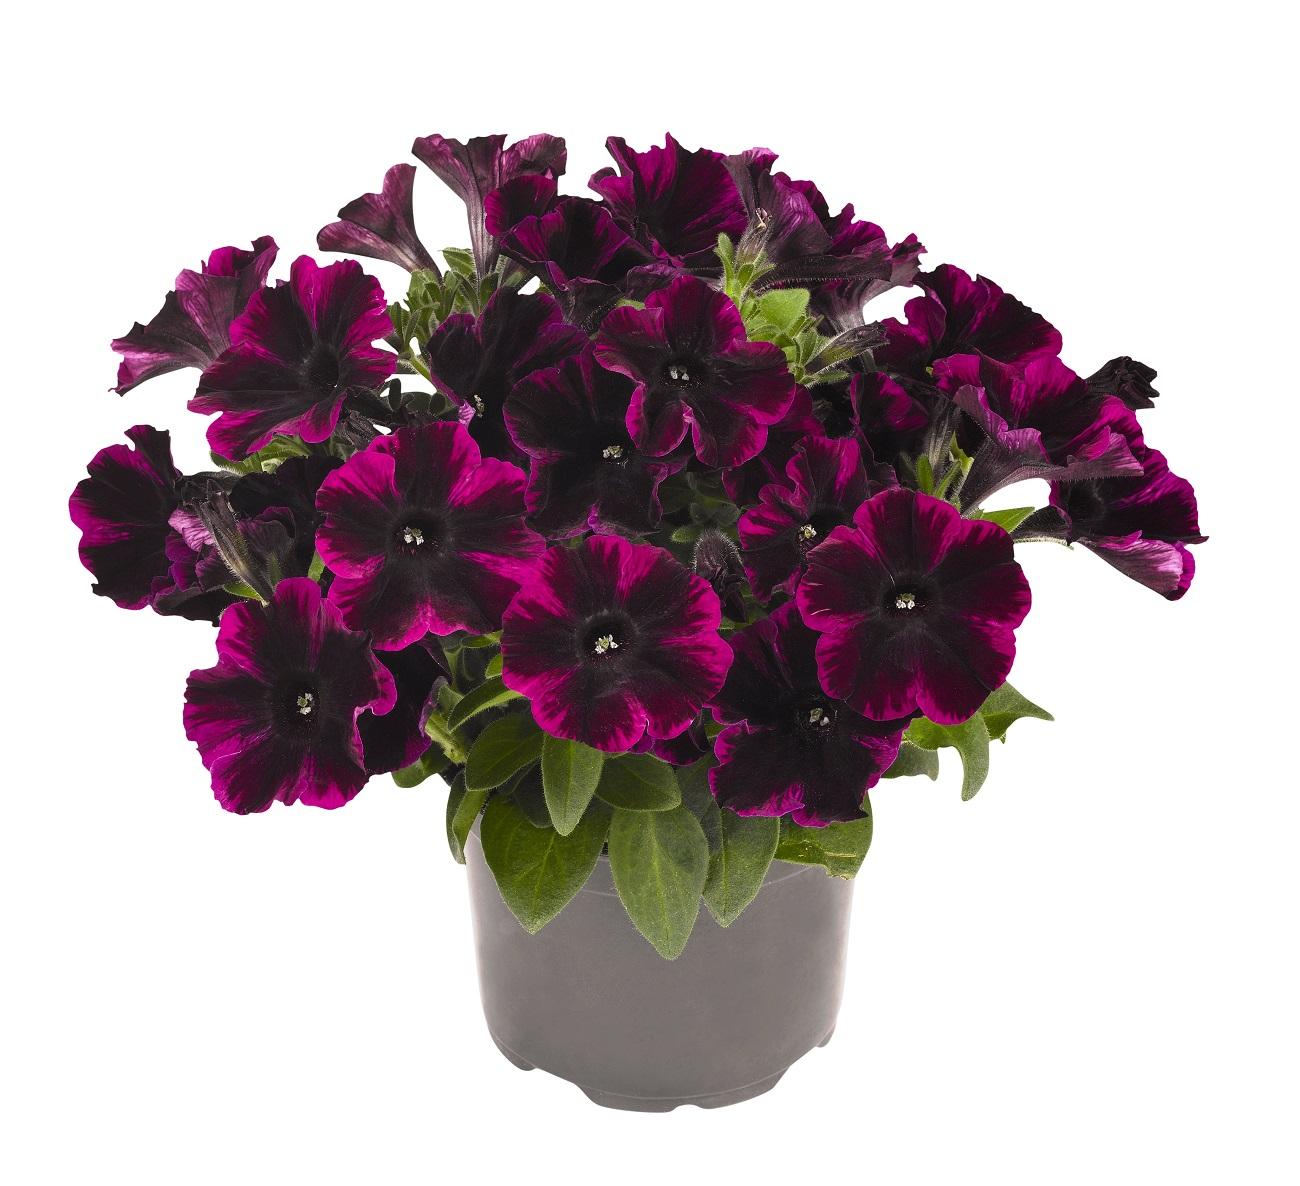 johnny flame nouveau petunia retombant barbaux fleurs. Black Bedroom Furniture Sets. Home Design Ideas